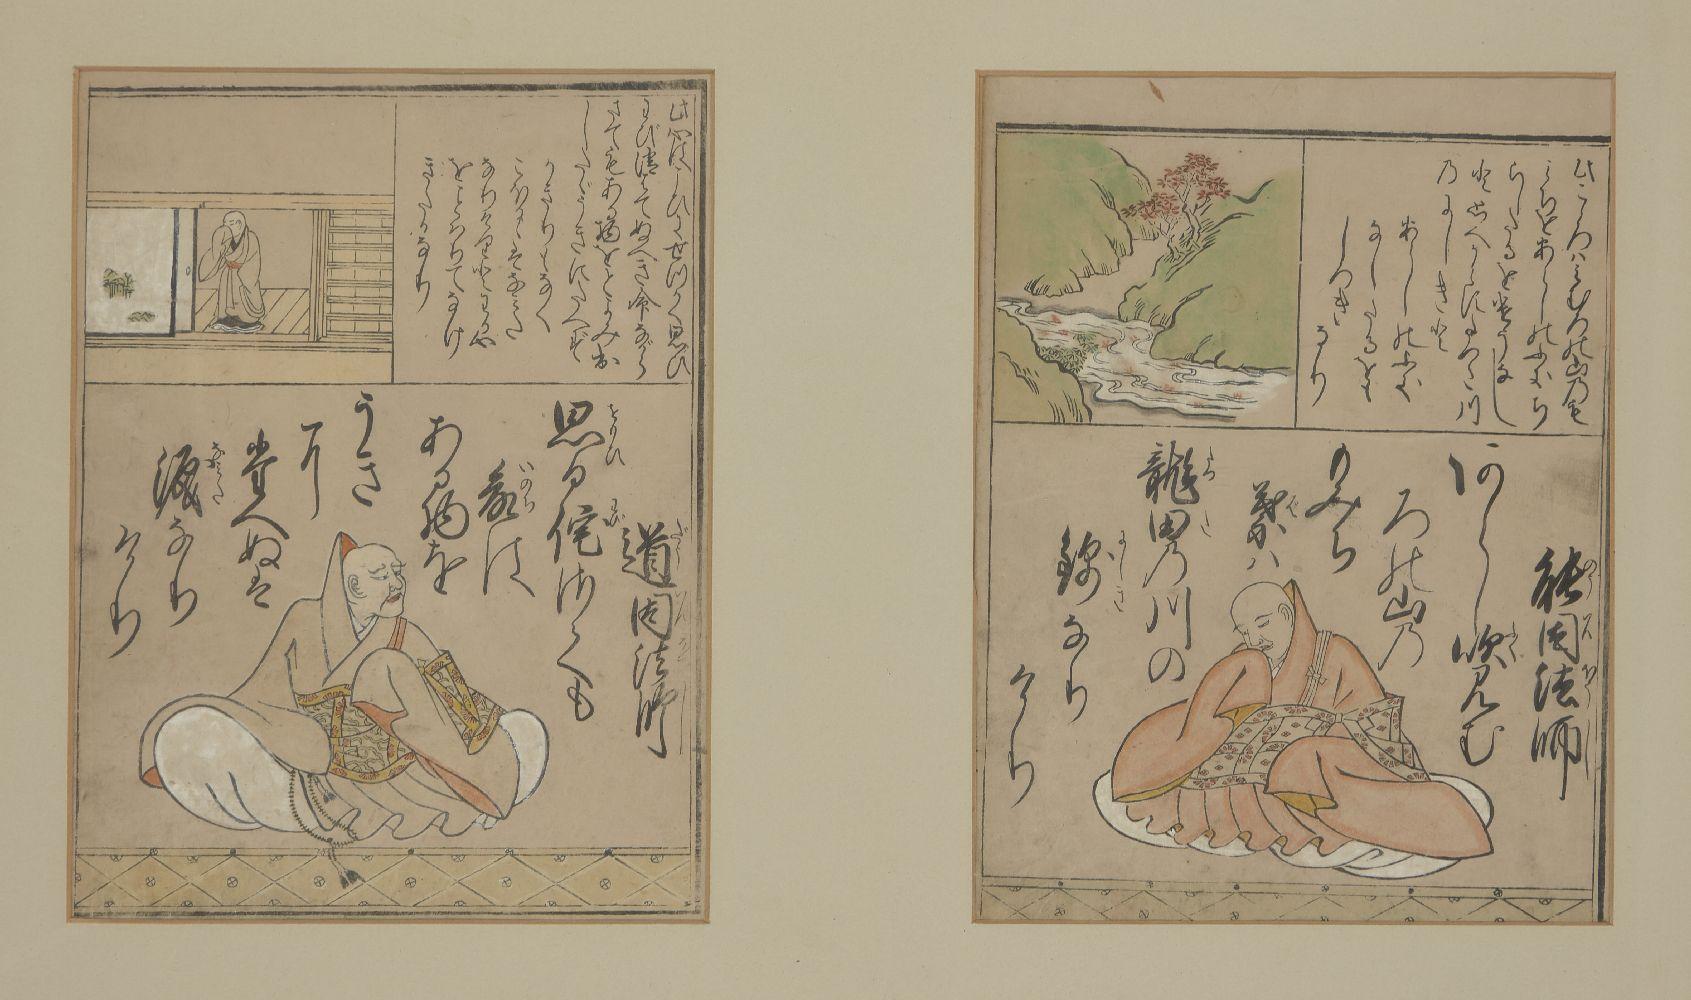 Moronobu School, Meiji Period, two book plates from Portraits of One Hundred Samurai Poets (Hyakunin